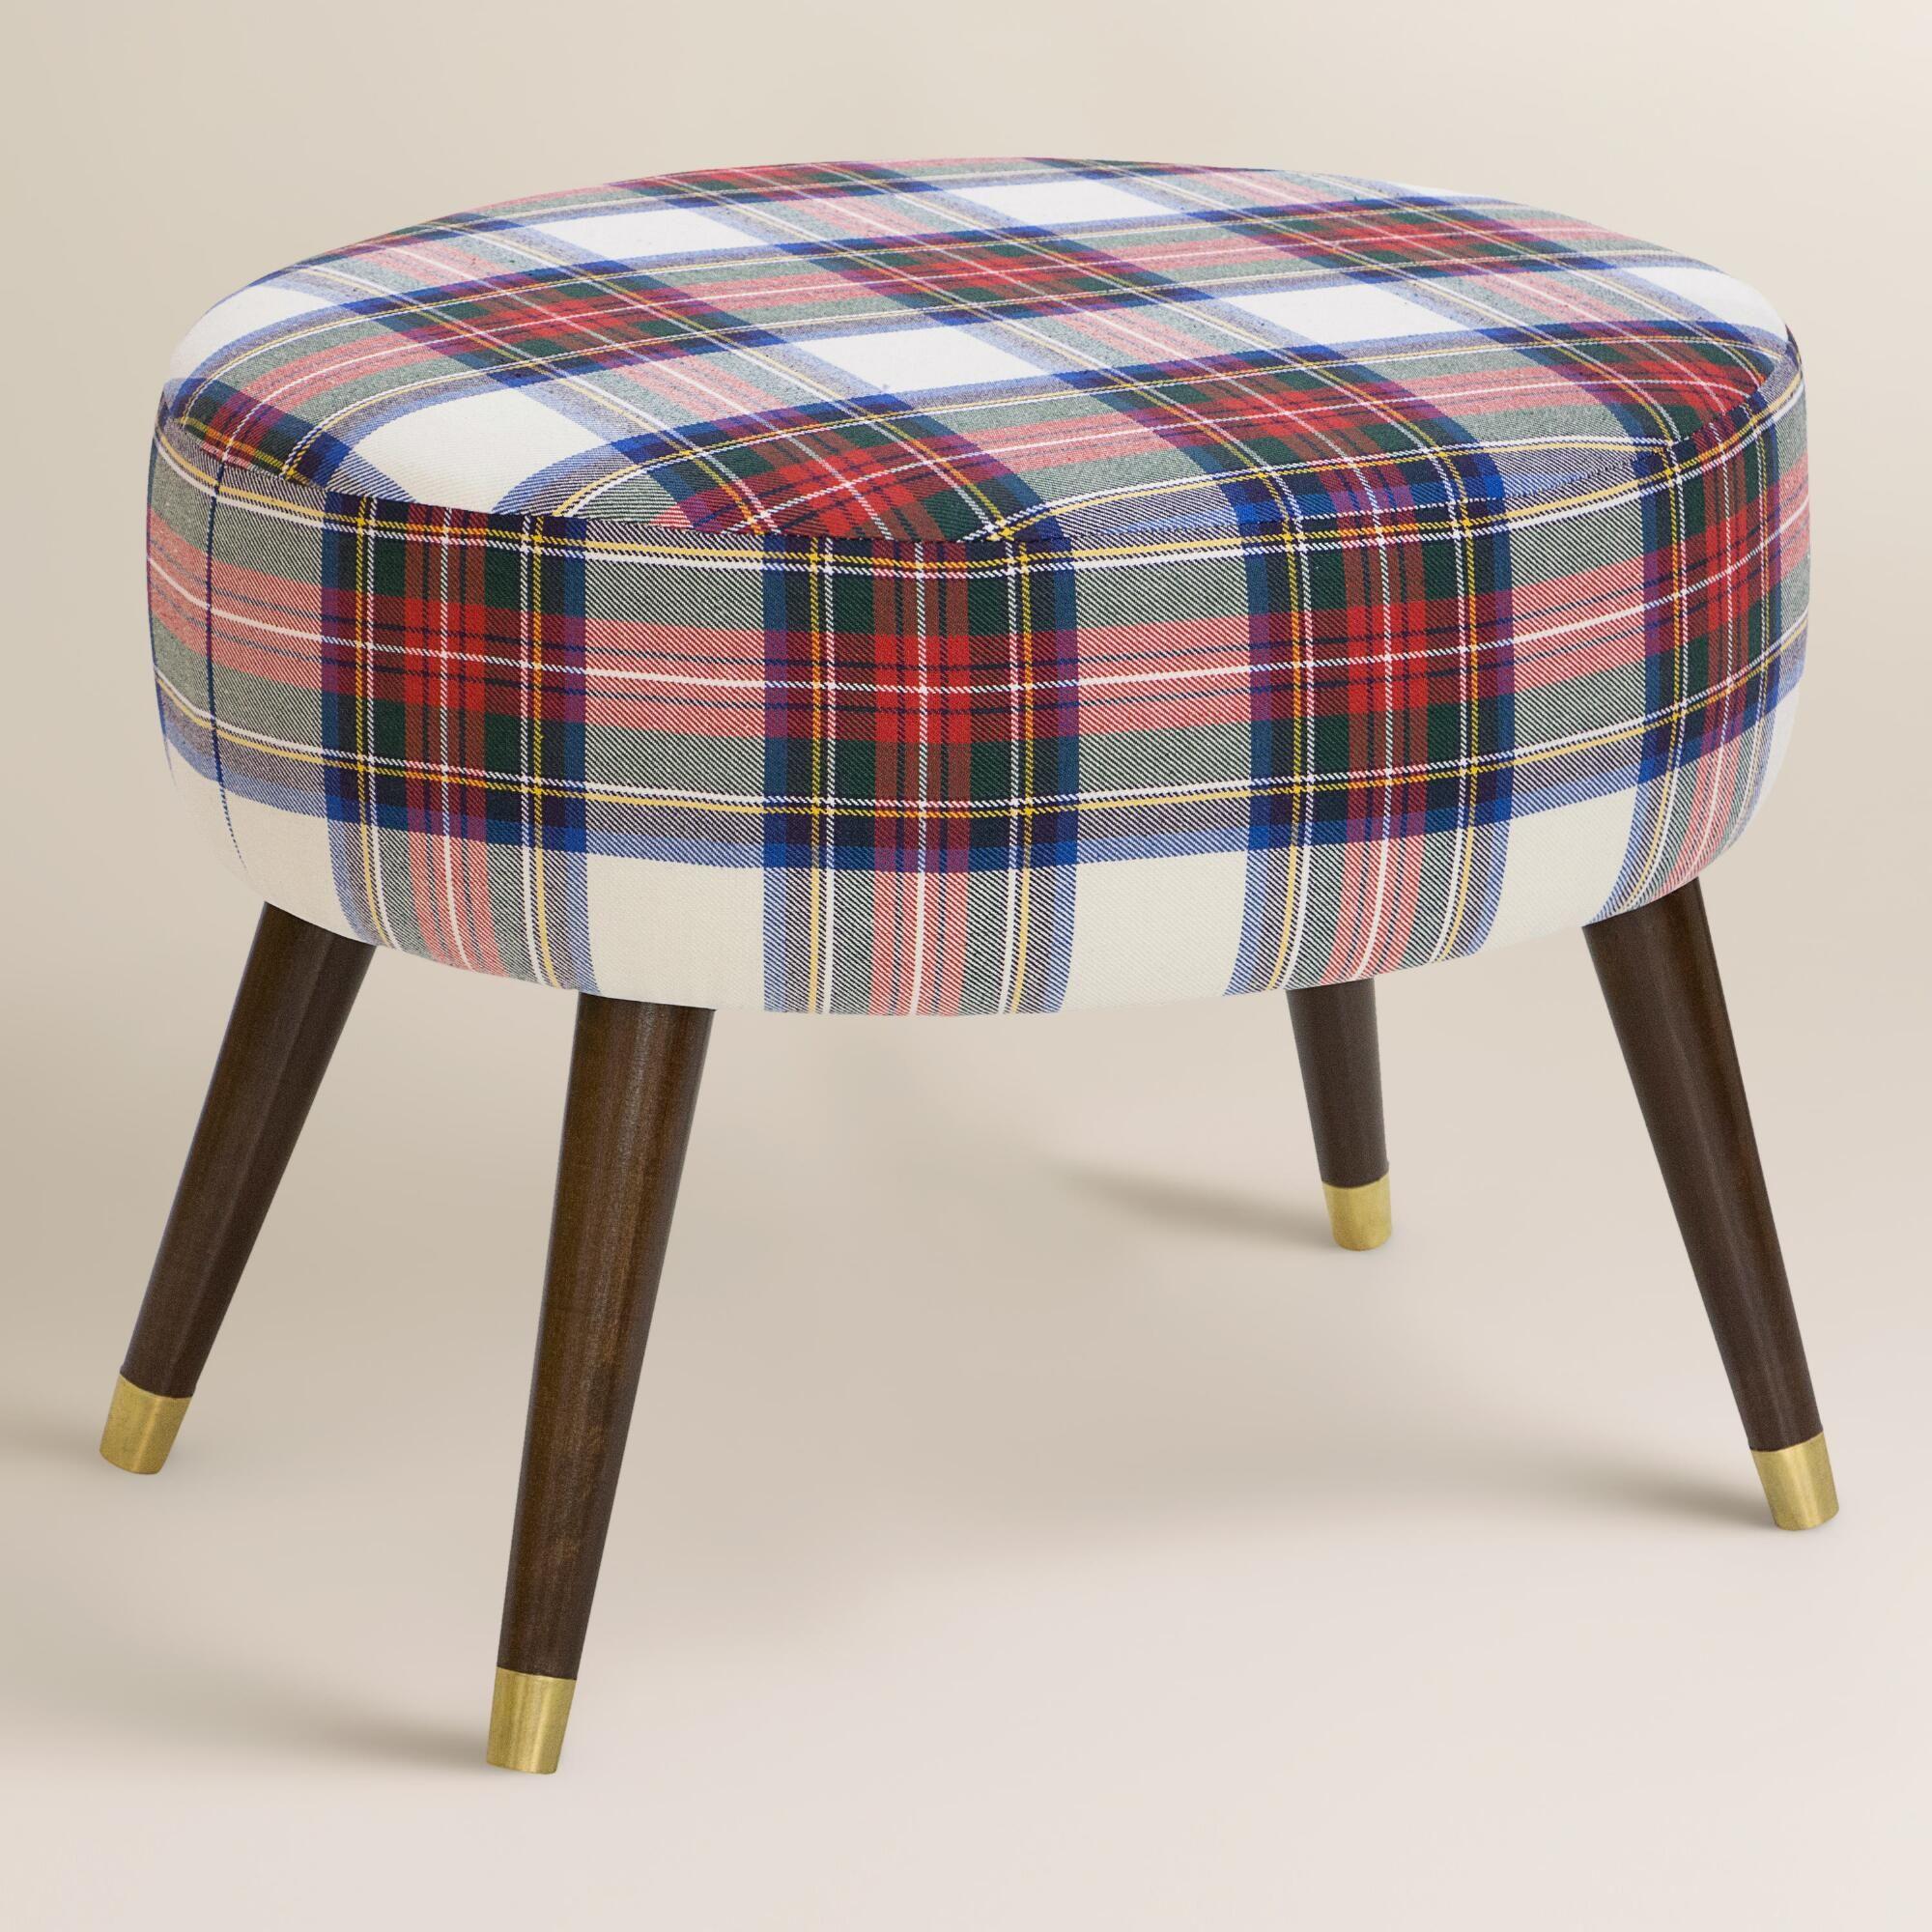 Awesome Oval Stewart Dress Plaid Upholstered Ottoman